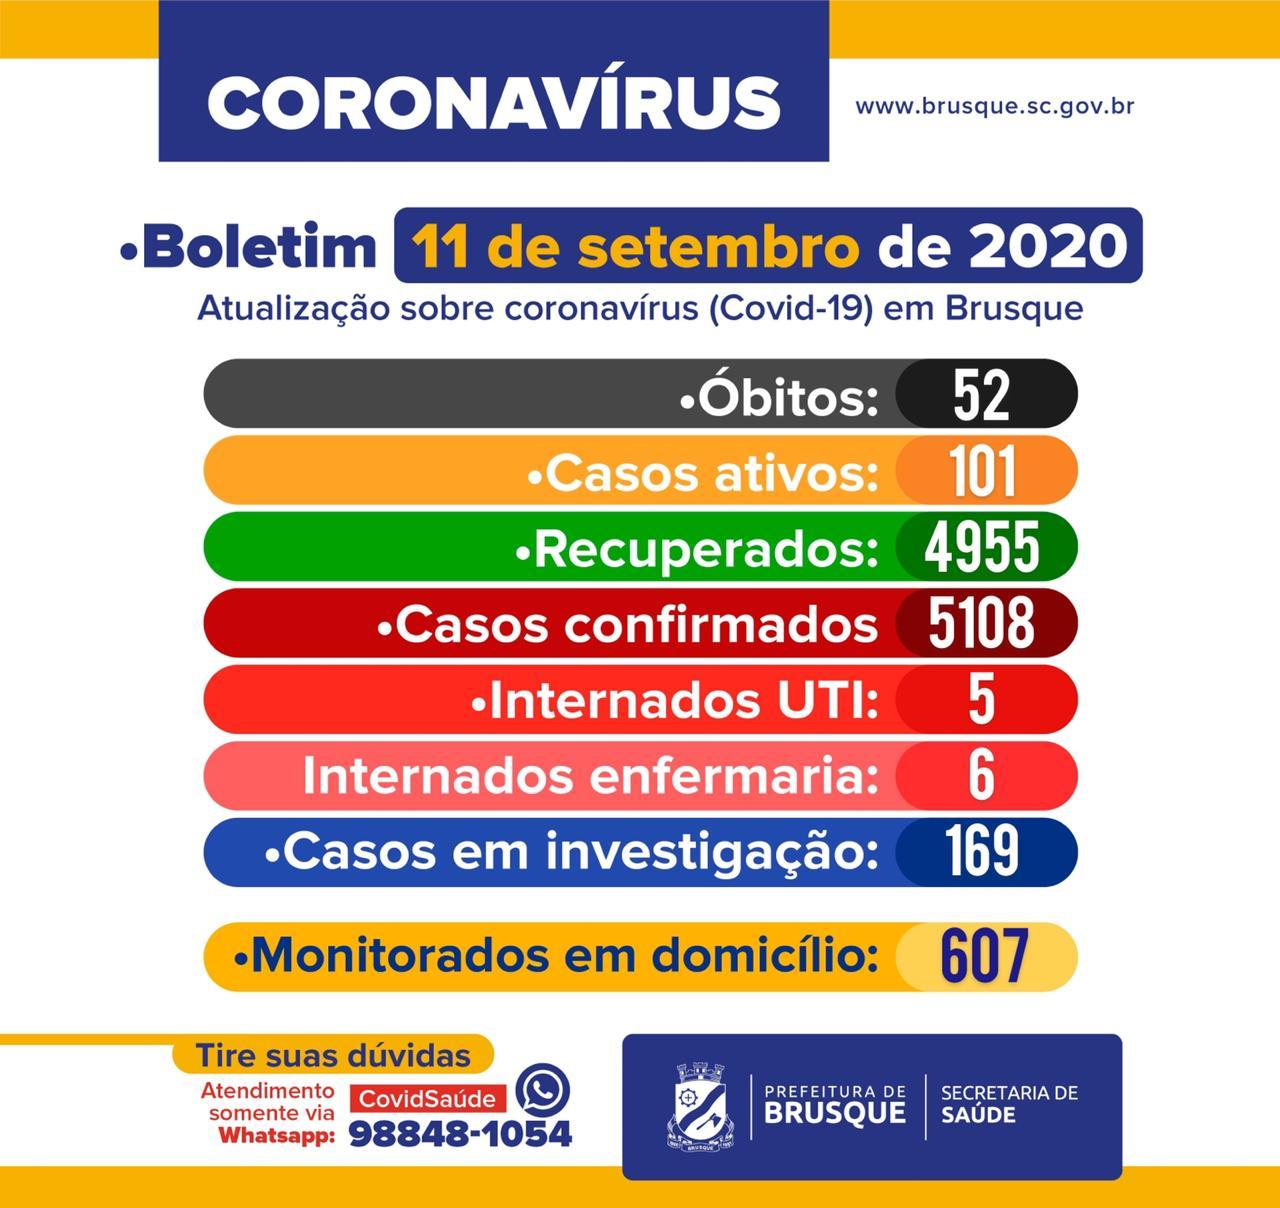 COVID-19: Boletim epidemiológico desta sexta-feira, 11 de setembro